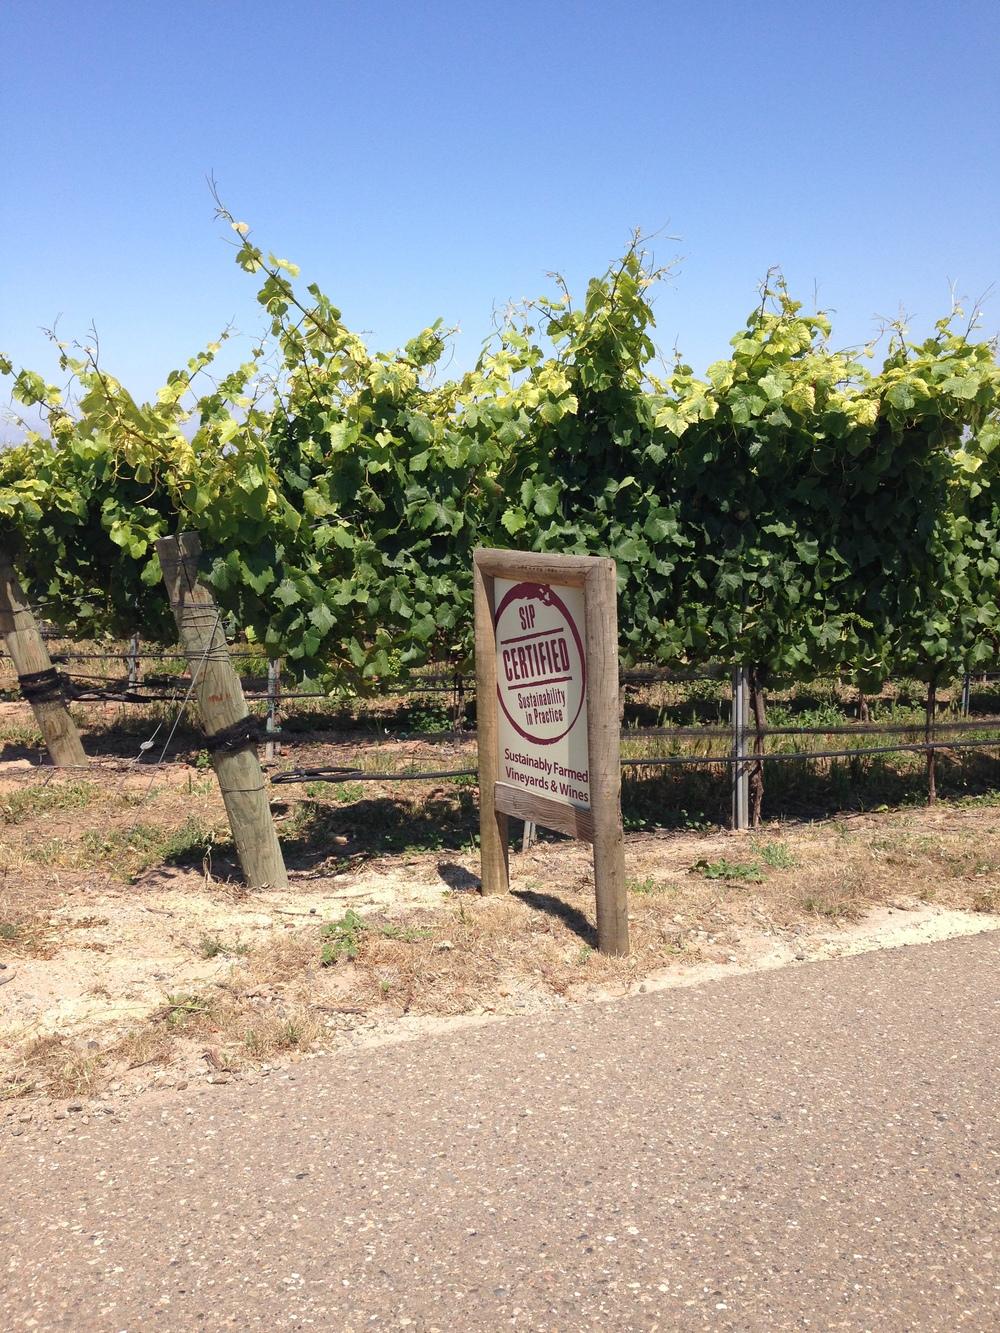 Presqu'ile Winery - SIP Certified | VAULT29